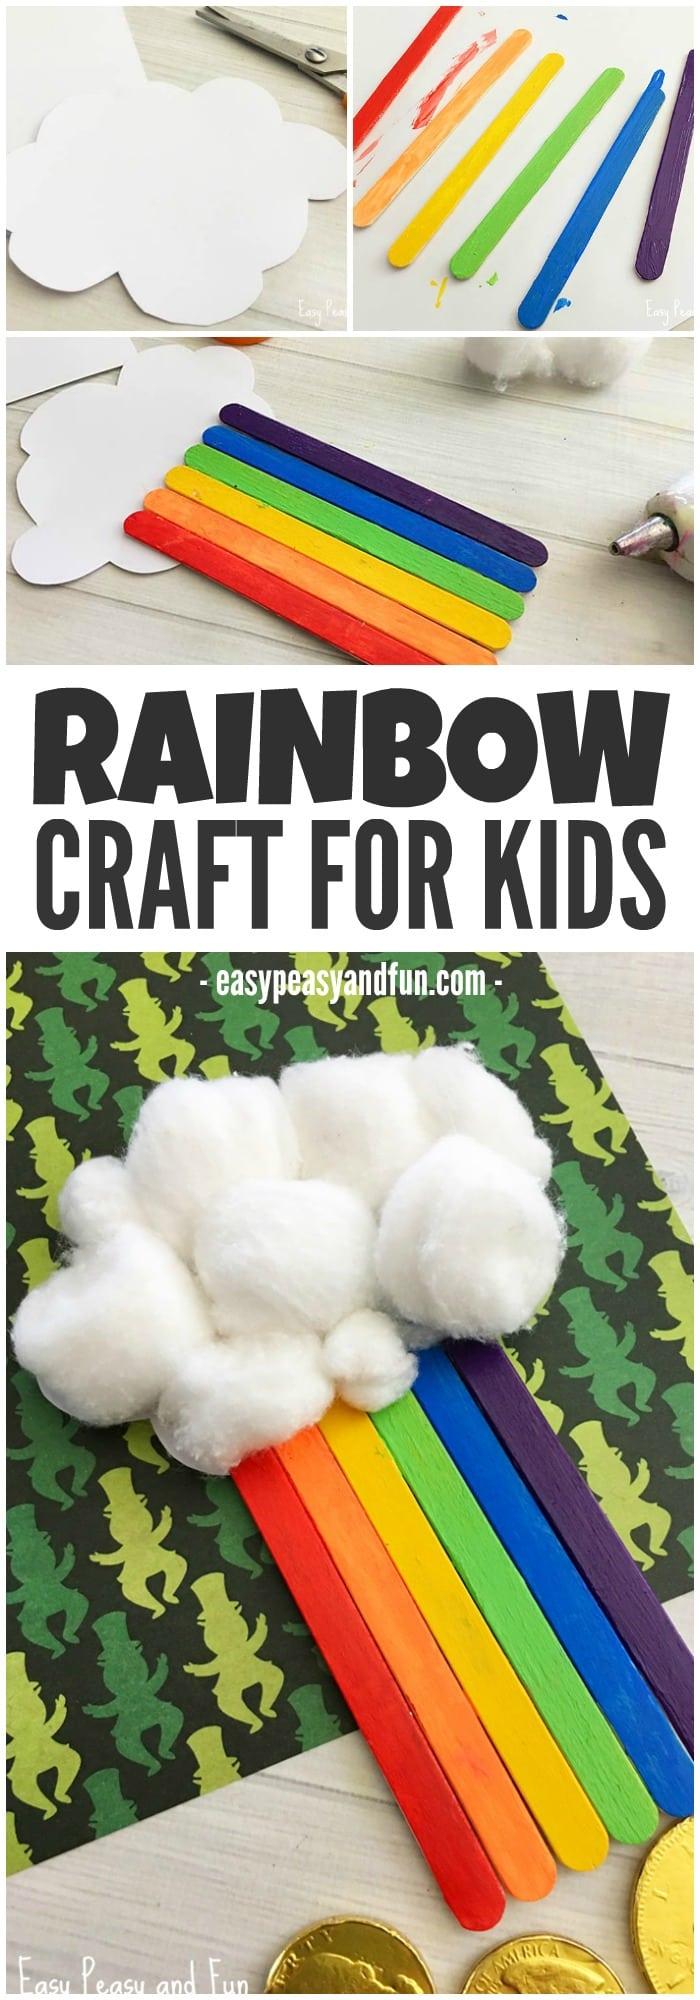 Cute Craft Sticks Rainbow Craft for Kids